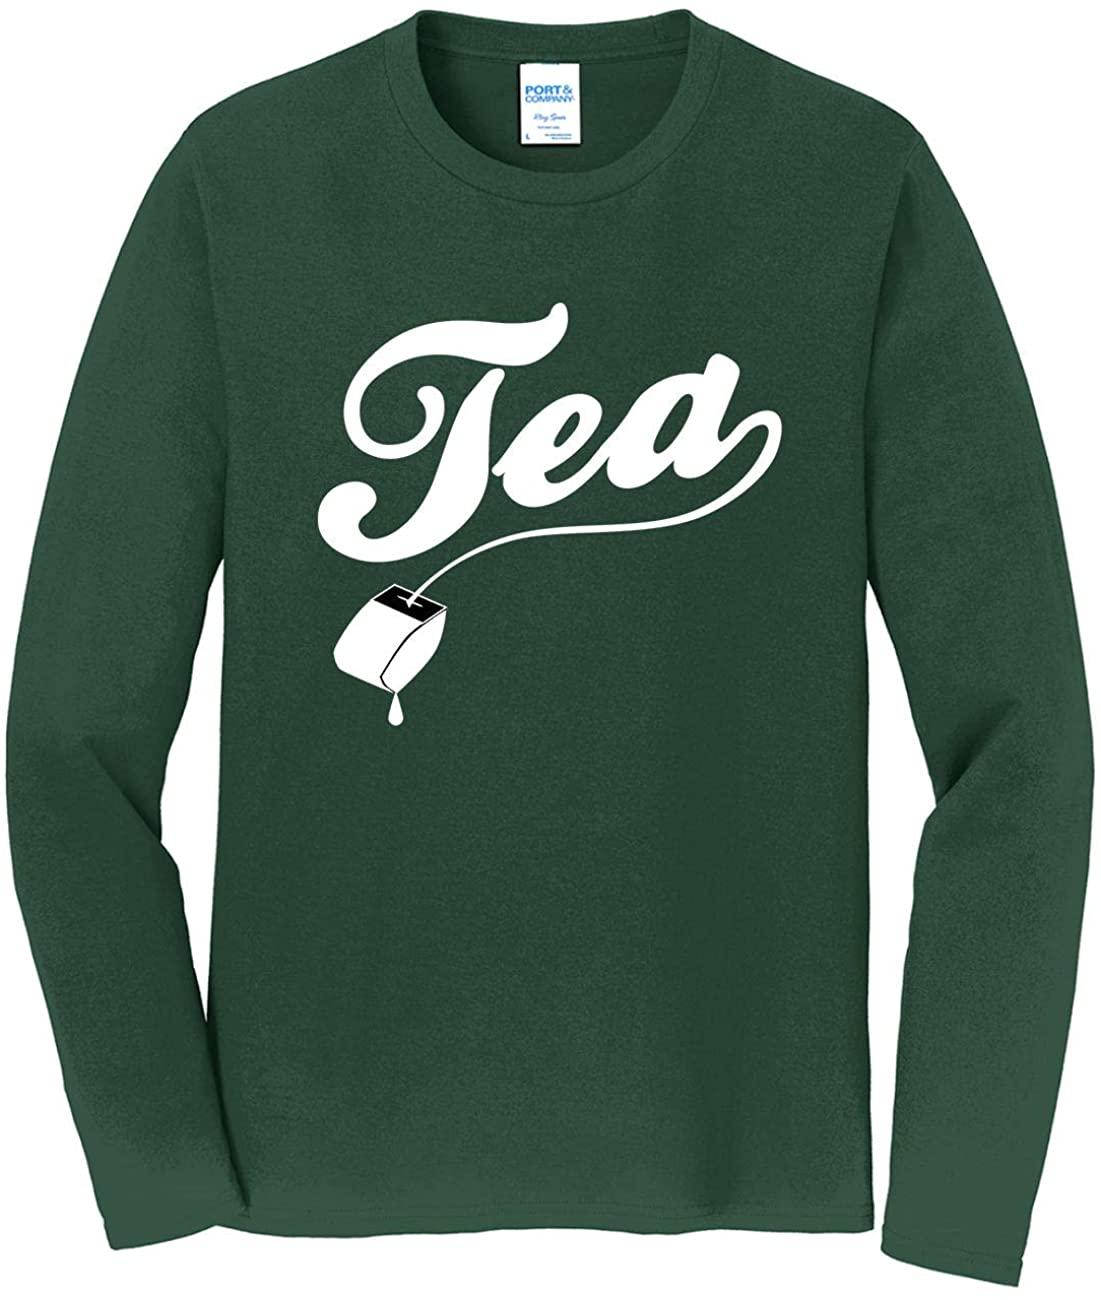 HARD EDGE DESIGN Men's Tea Long Sleeve T-Shirt, 5X-Large, Forest Green